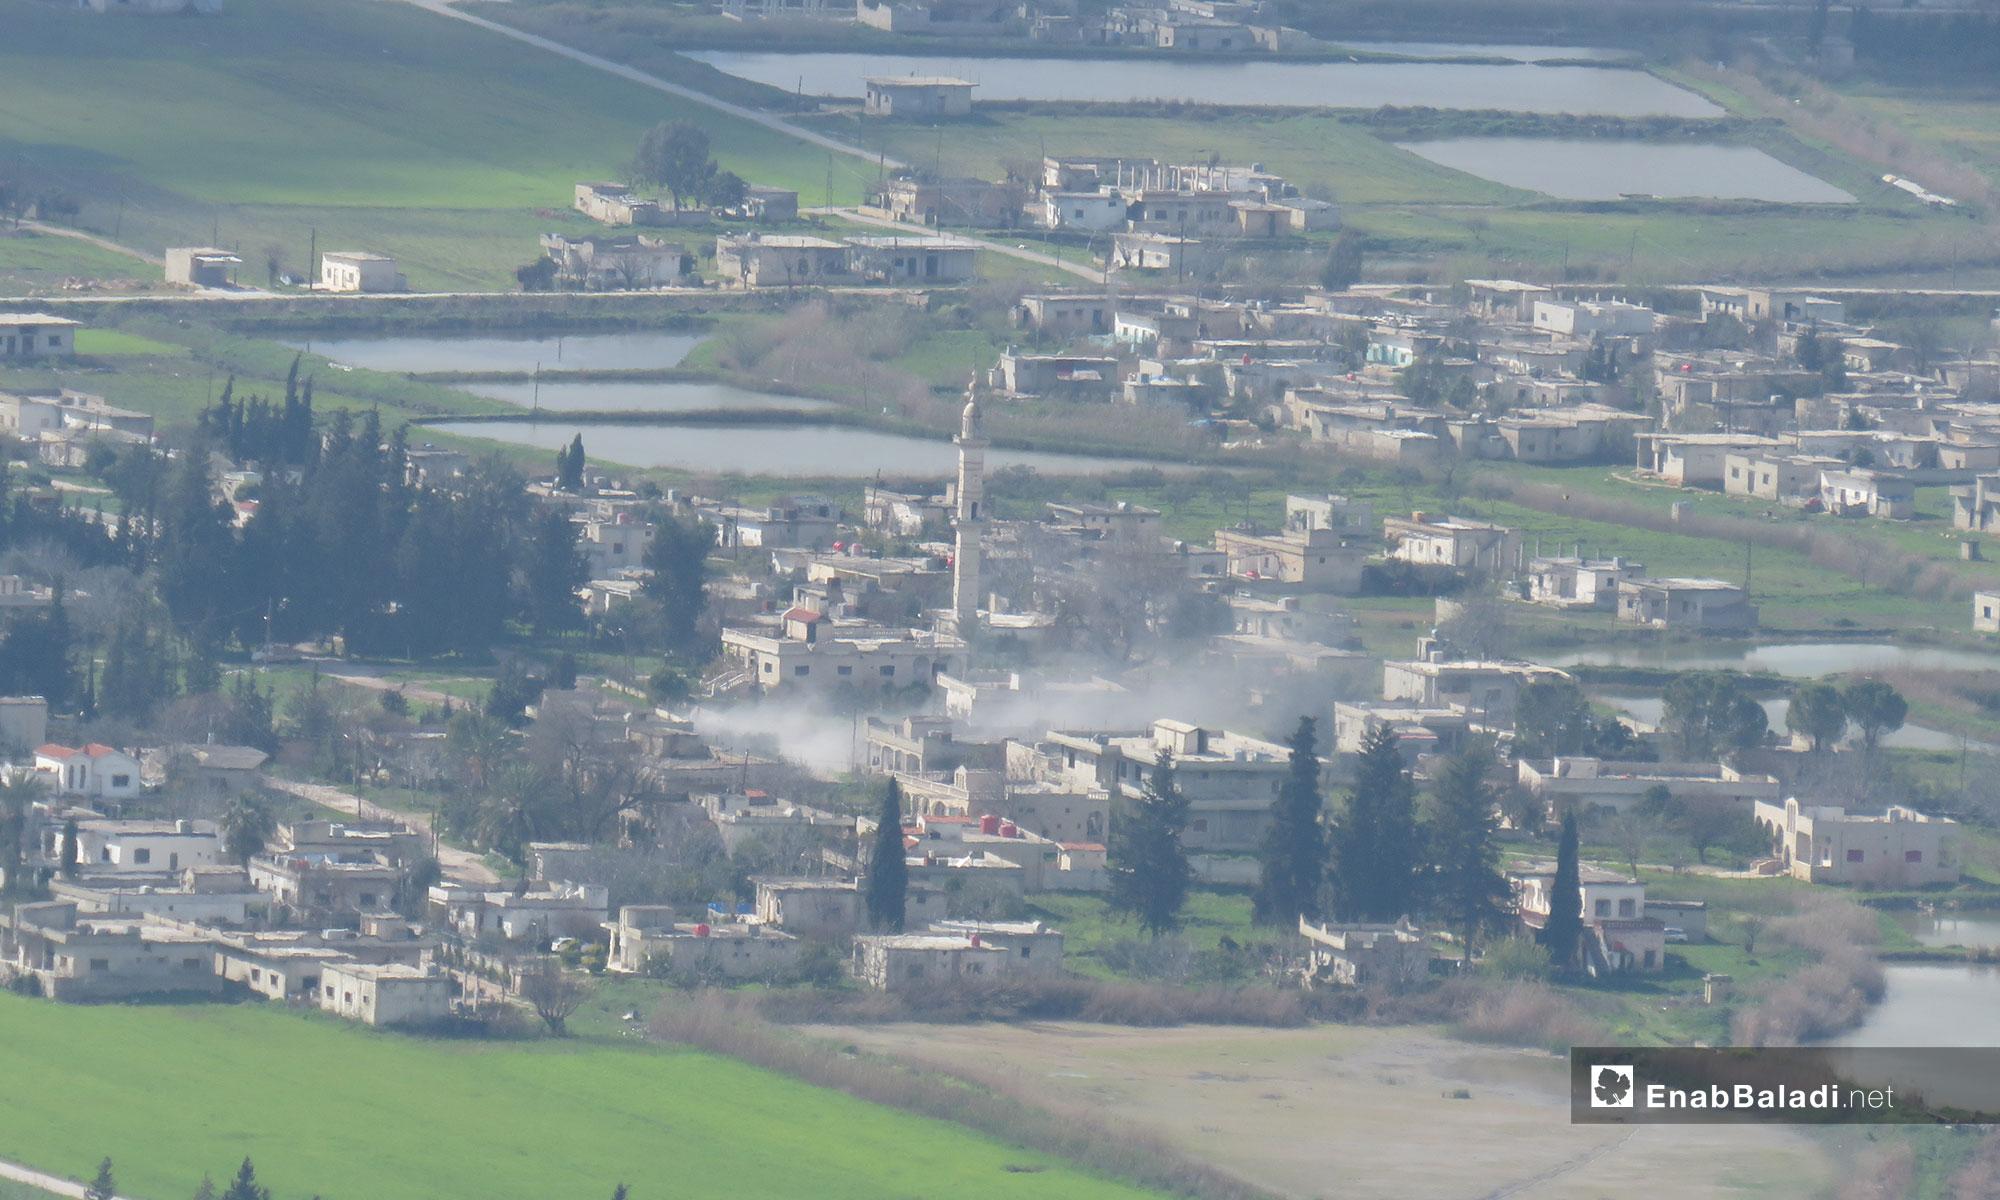 The shelling of the village of al-Huwayz, rural Hama – March 18, 2019 (Enab Baladi)